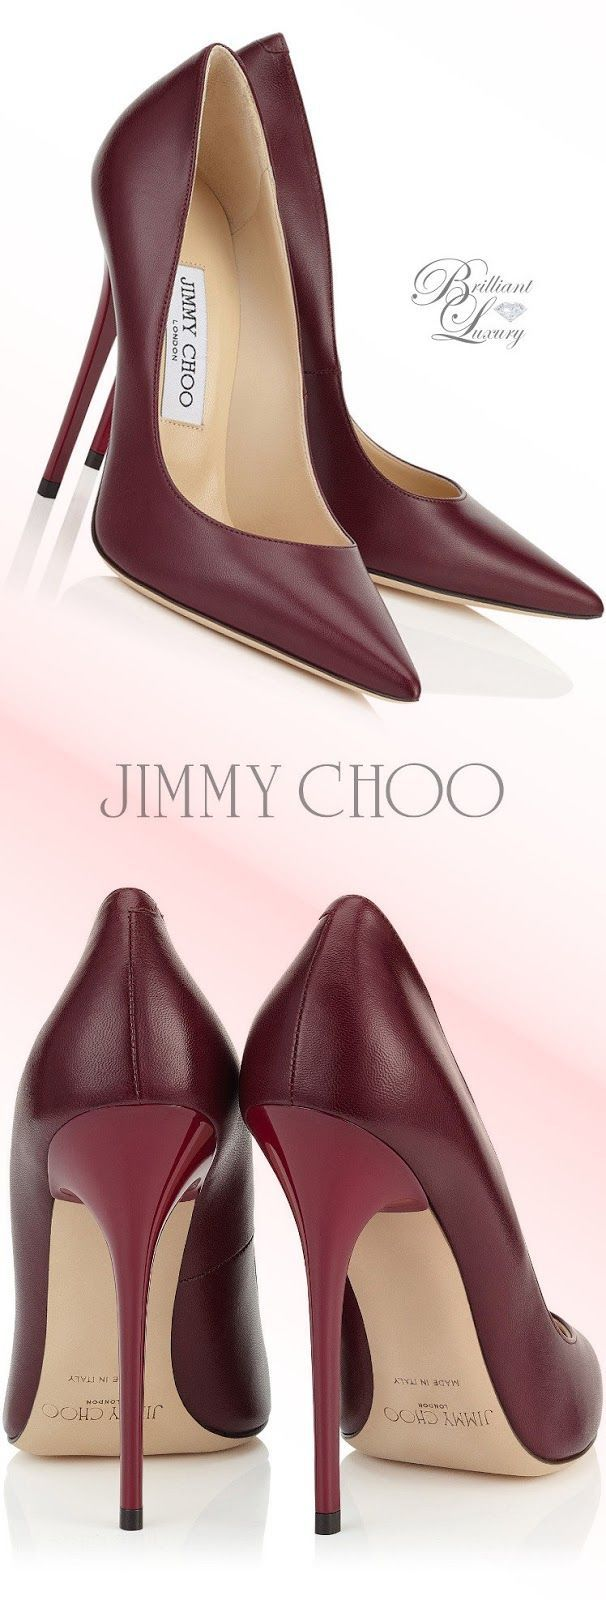 Jimmy Choo -blackberry stilettos                              …